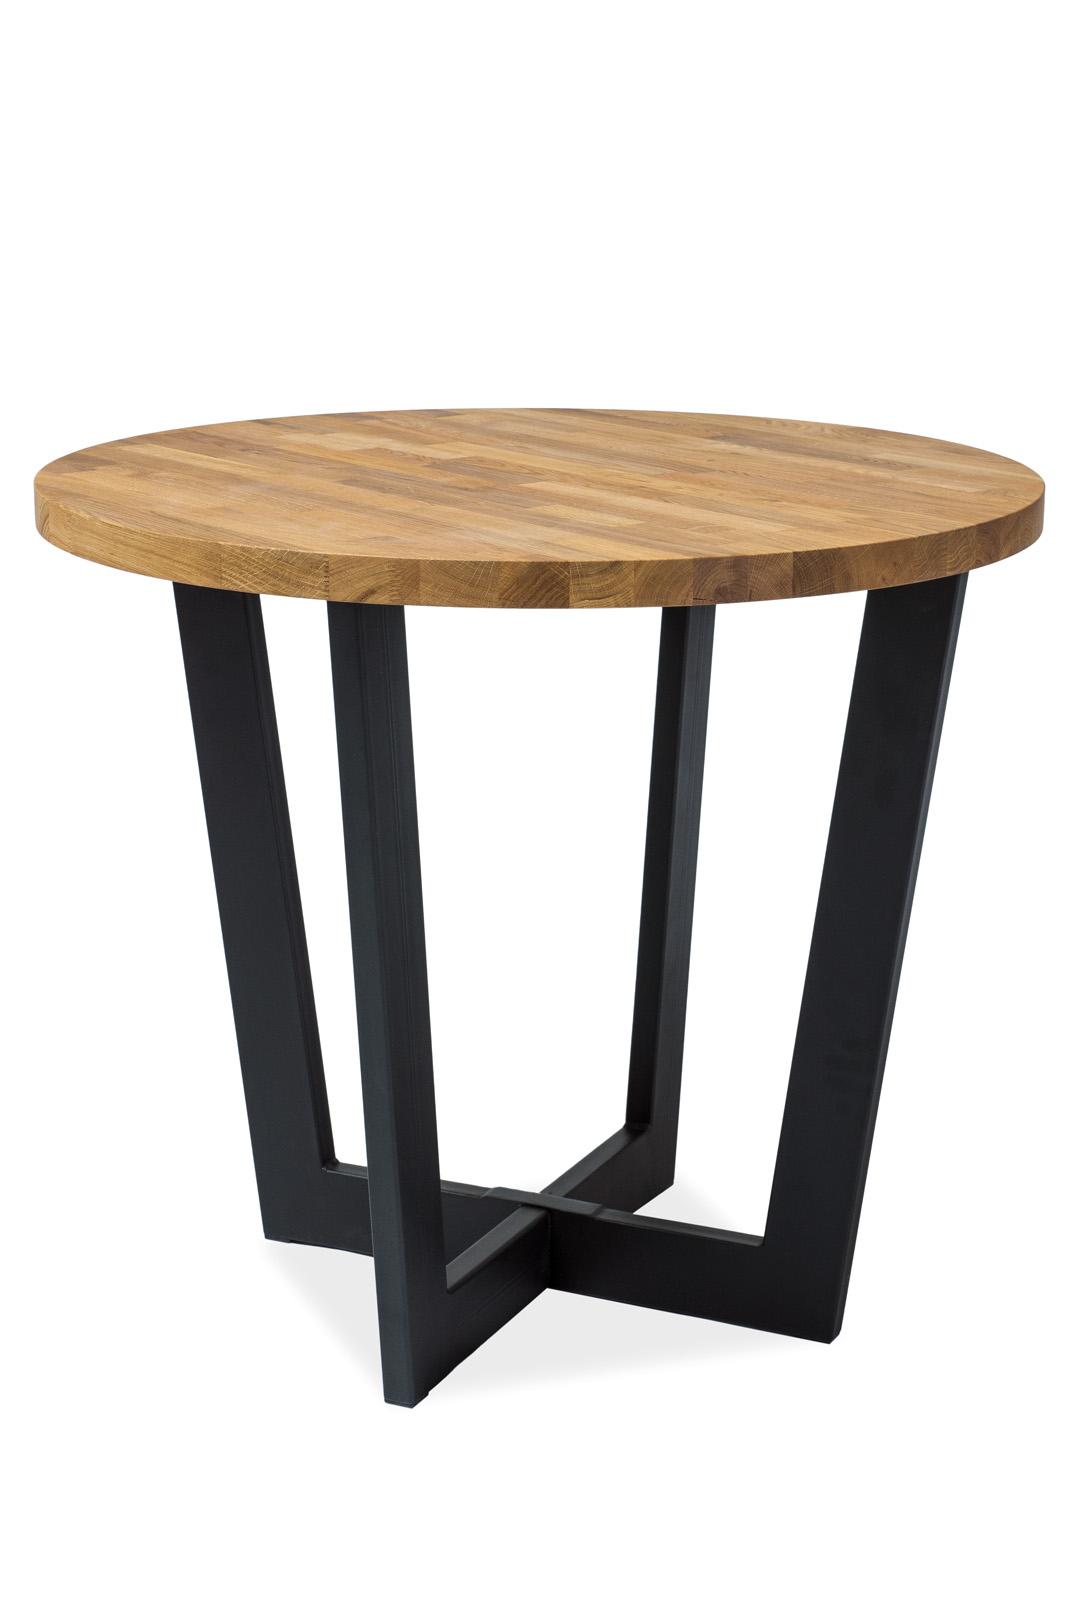 Masa din metal si lemn de stejar Cono Dab, Ø90xh78 cm imagine